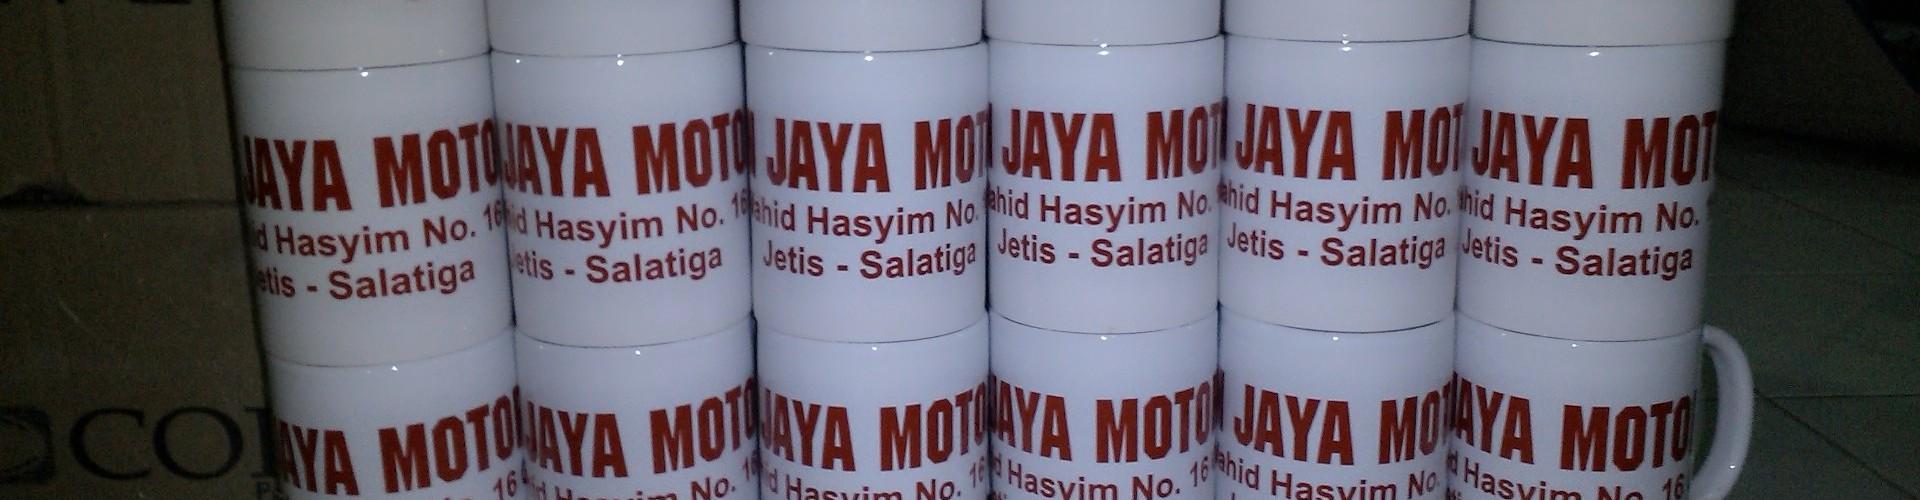 Souvenir Gelas Murah Jakarta Bekasi